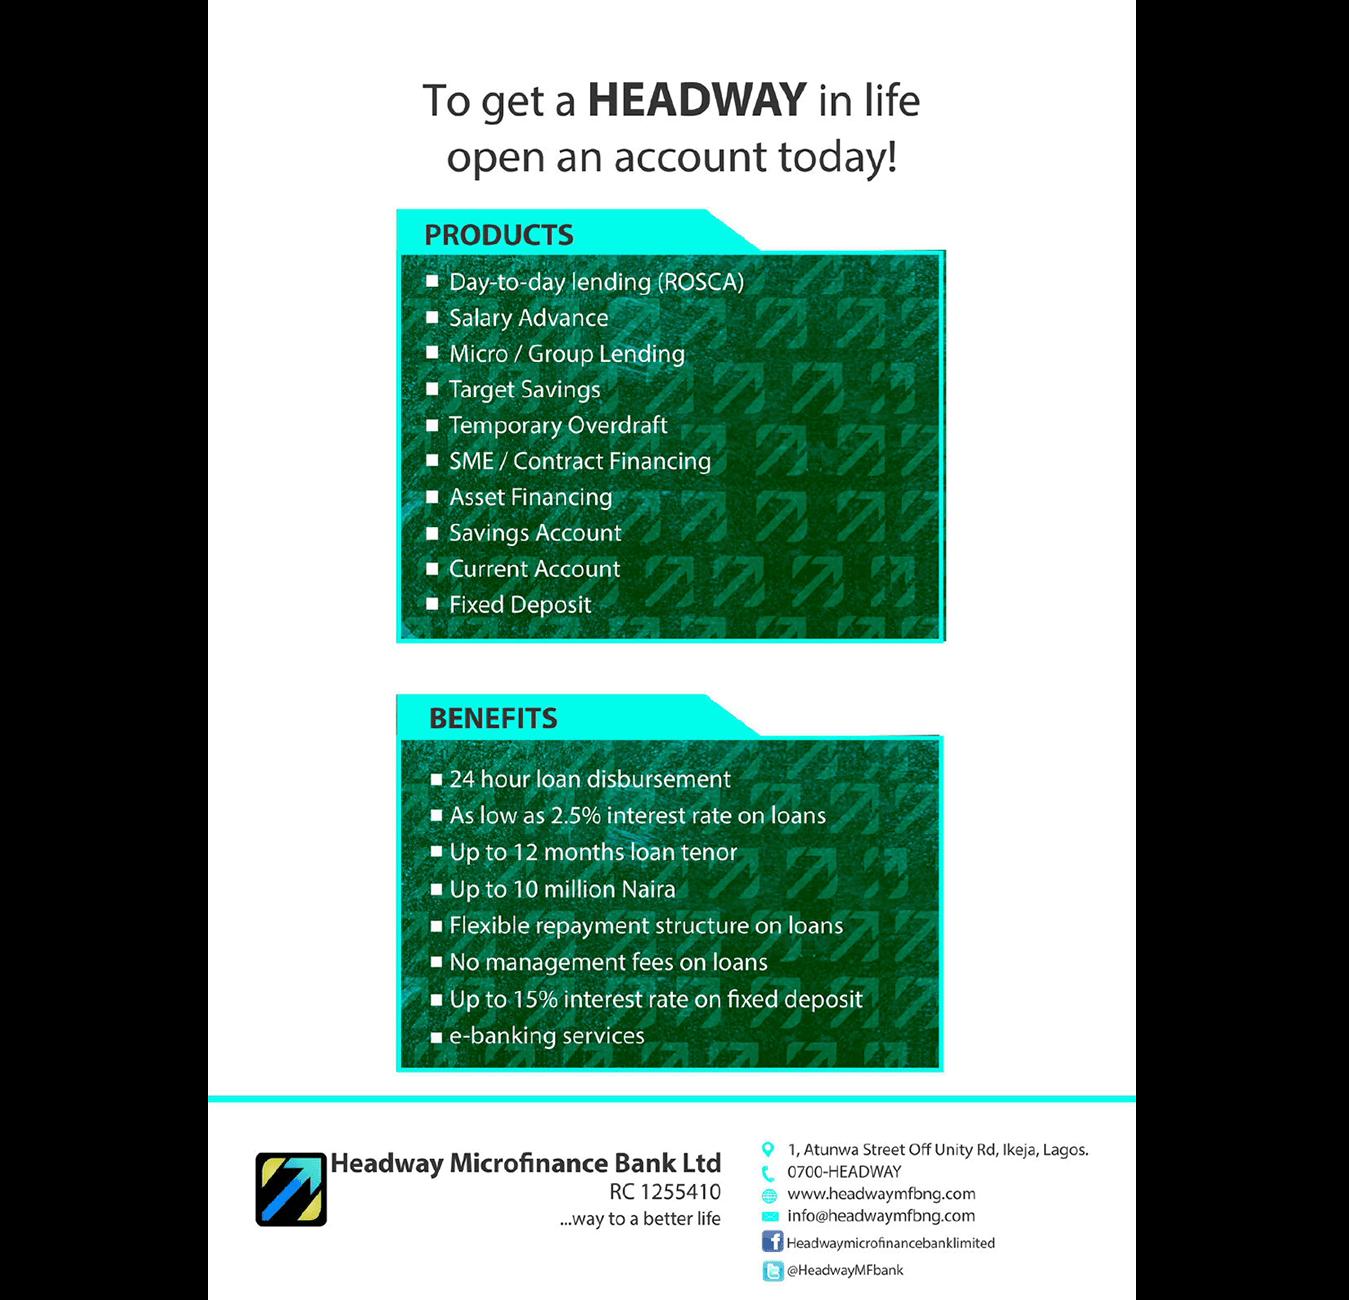 headway1 (2).